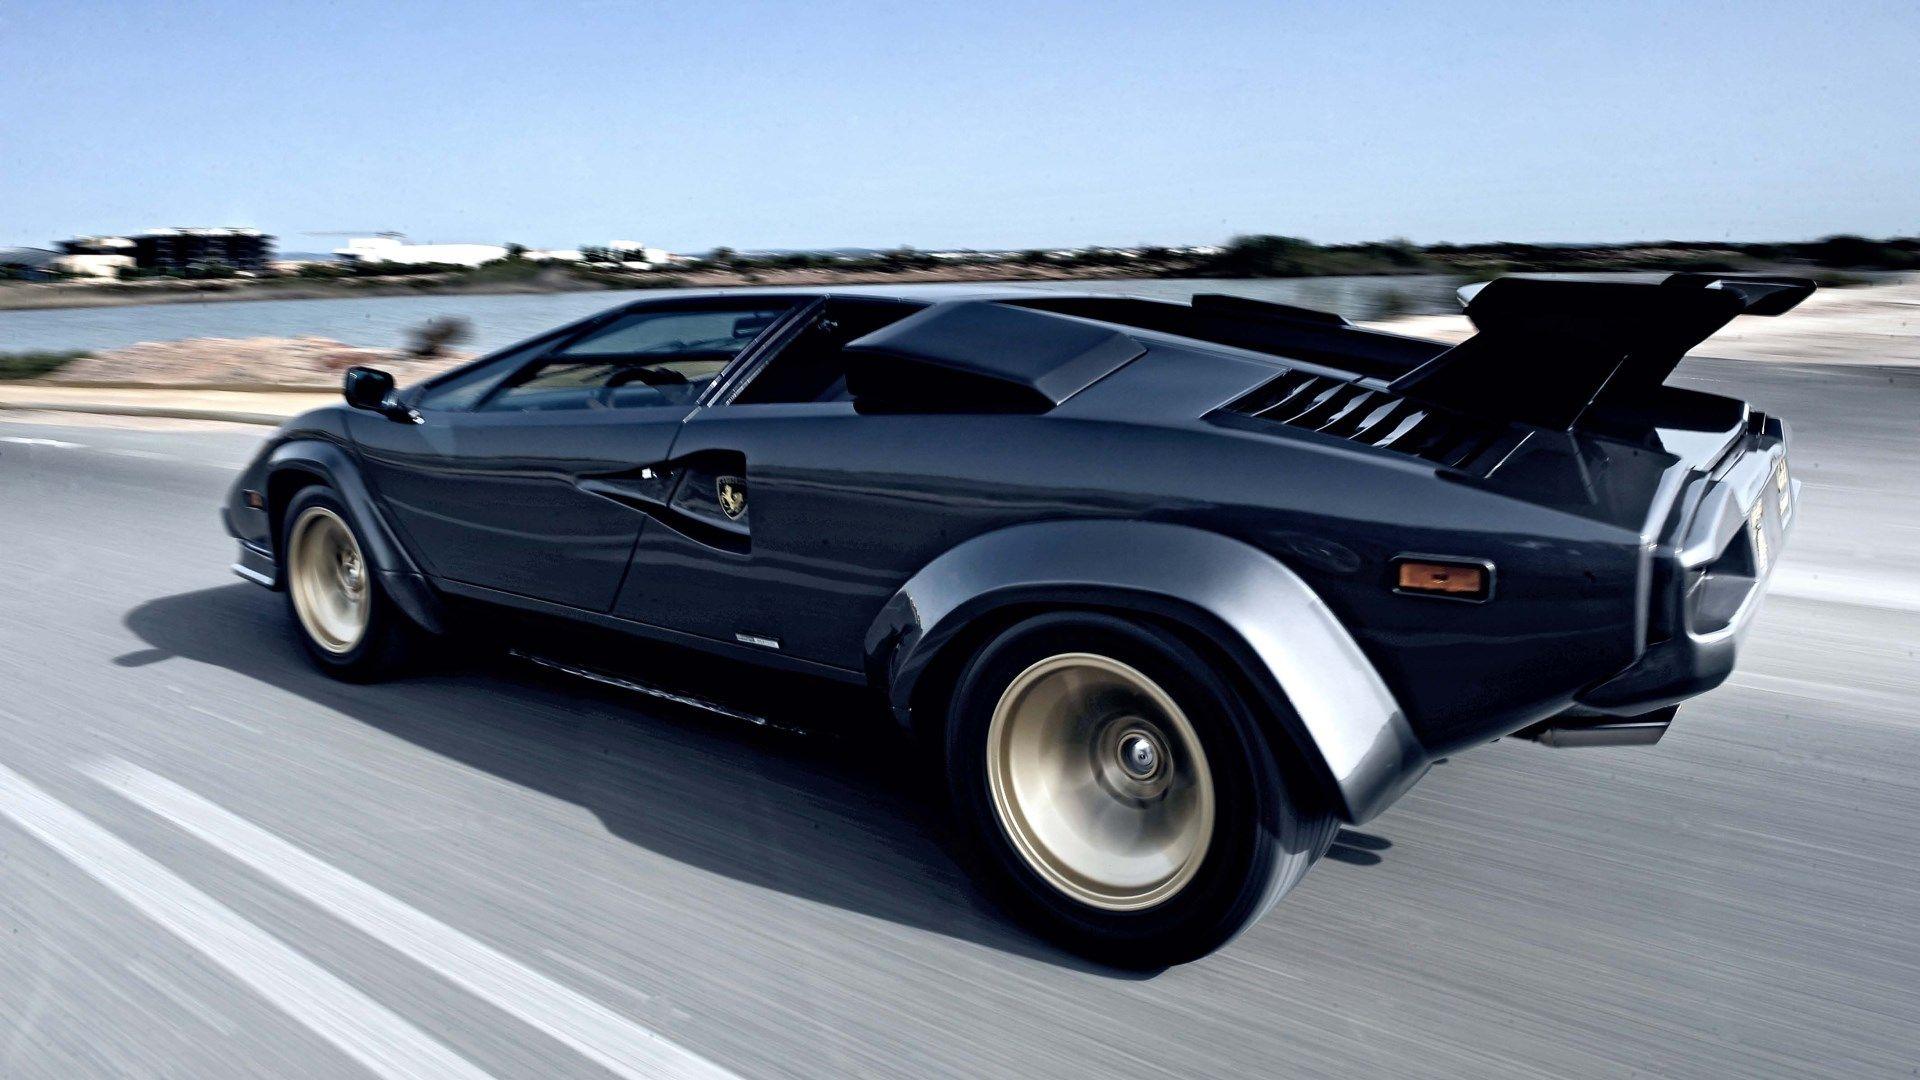 7cb4156ebb88e4bfc6729129fdfa614b Exciting Lamborghini Countach Nfs Most Wanted Cars Trend